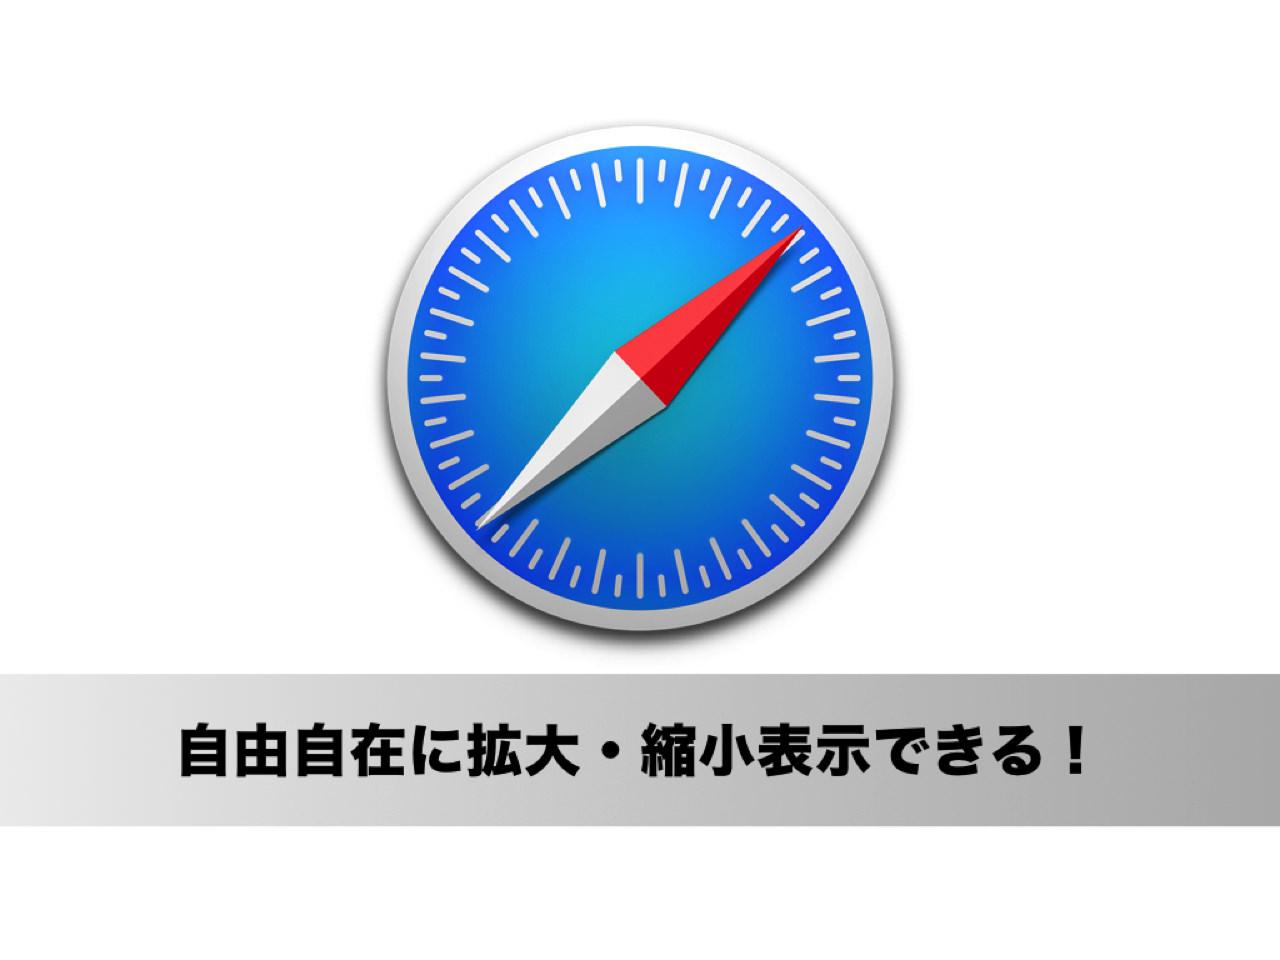 「Safari」で開いたWebページを自由自在に拡大・縮小できる機能拡張「Zoom」